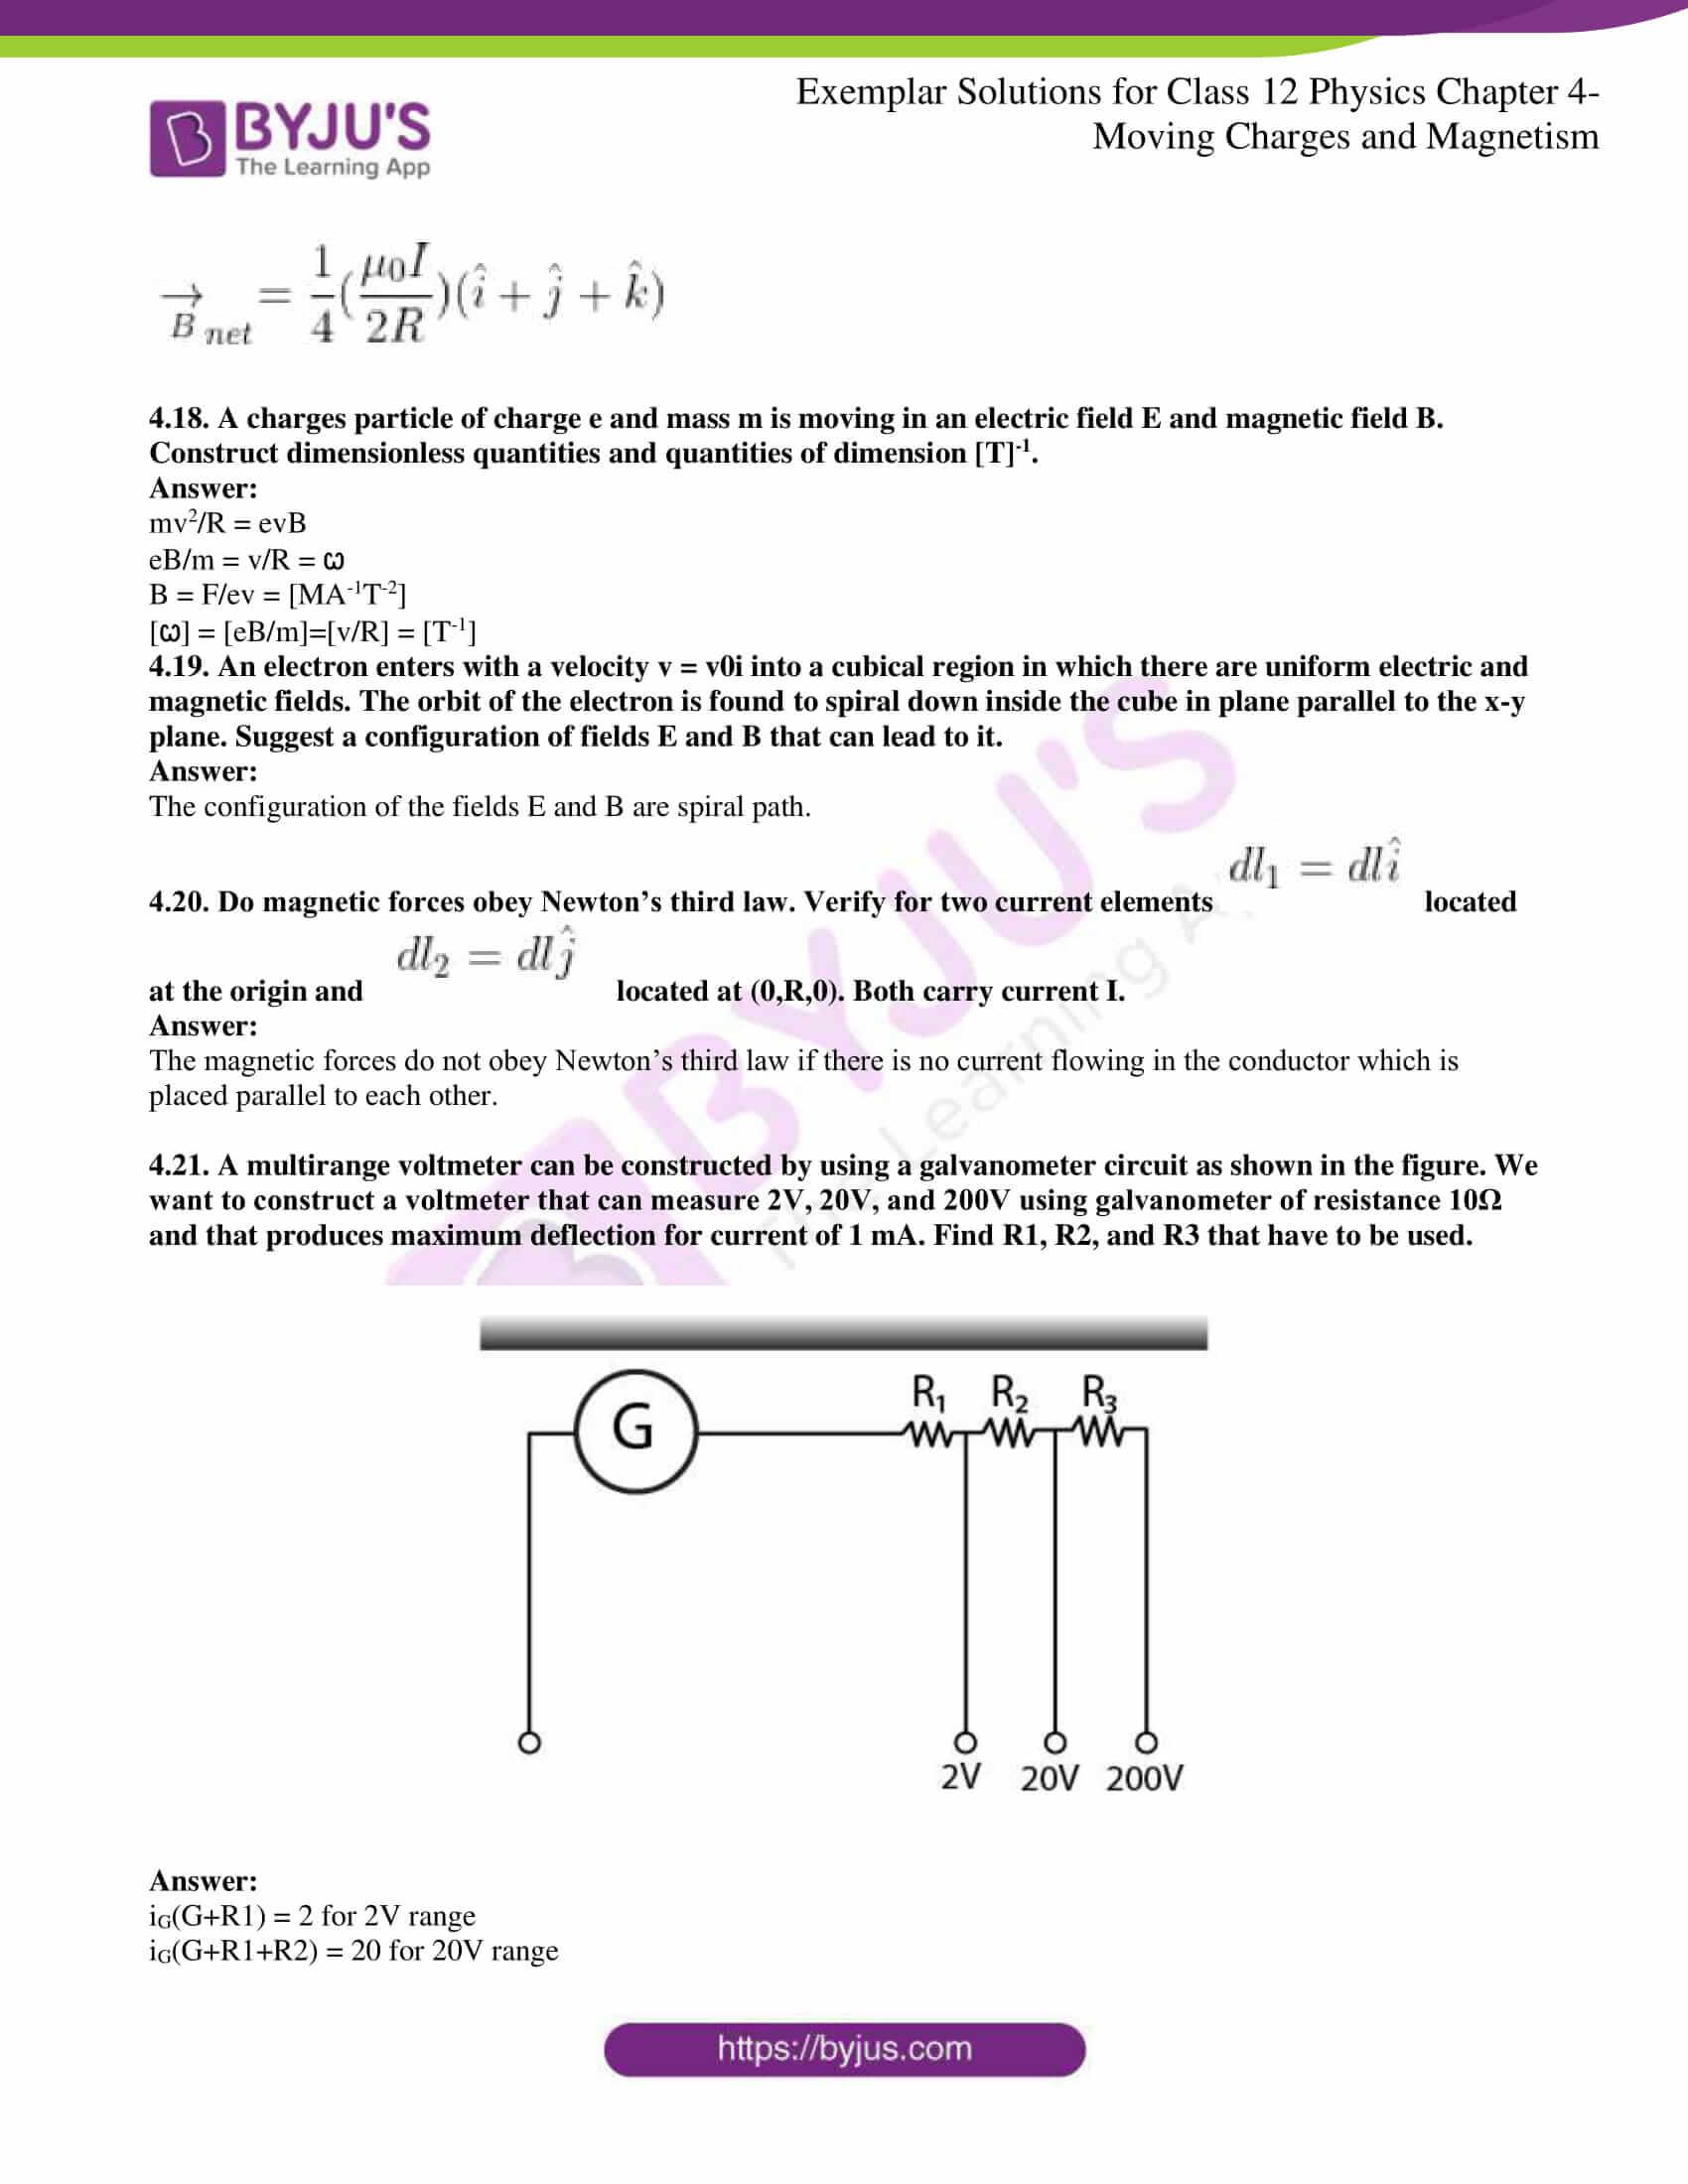 ncert exemplar solutions for class 12 physics chapter 4 05